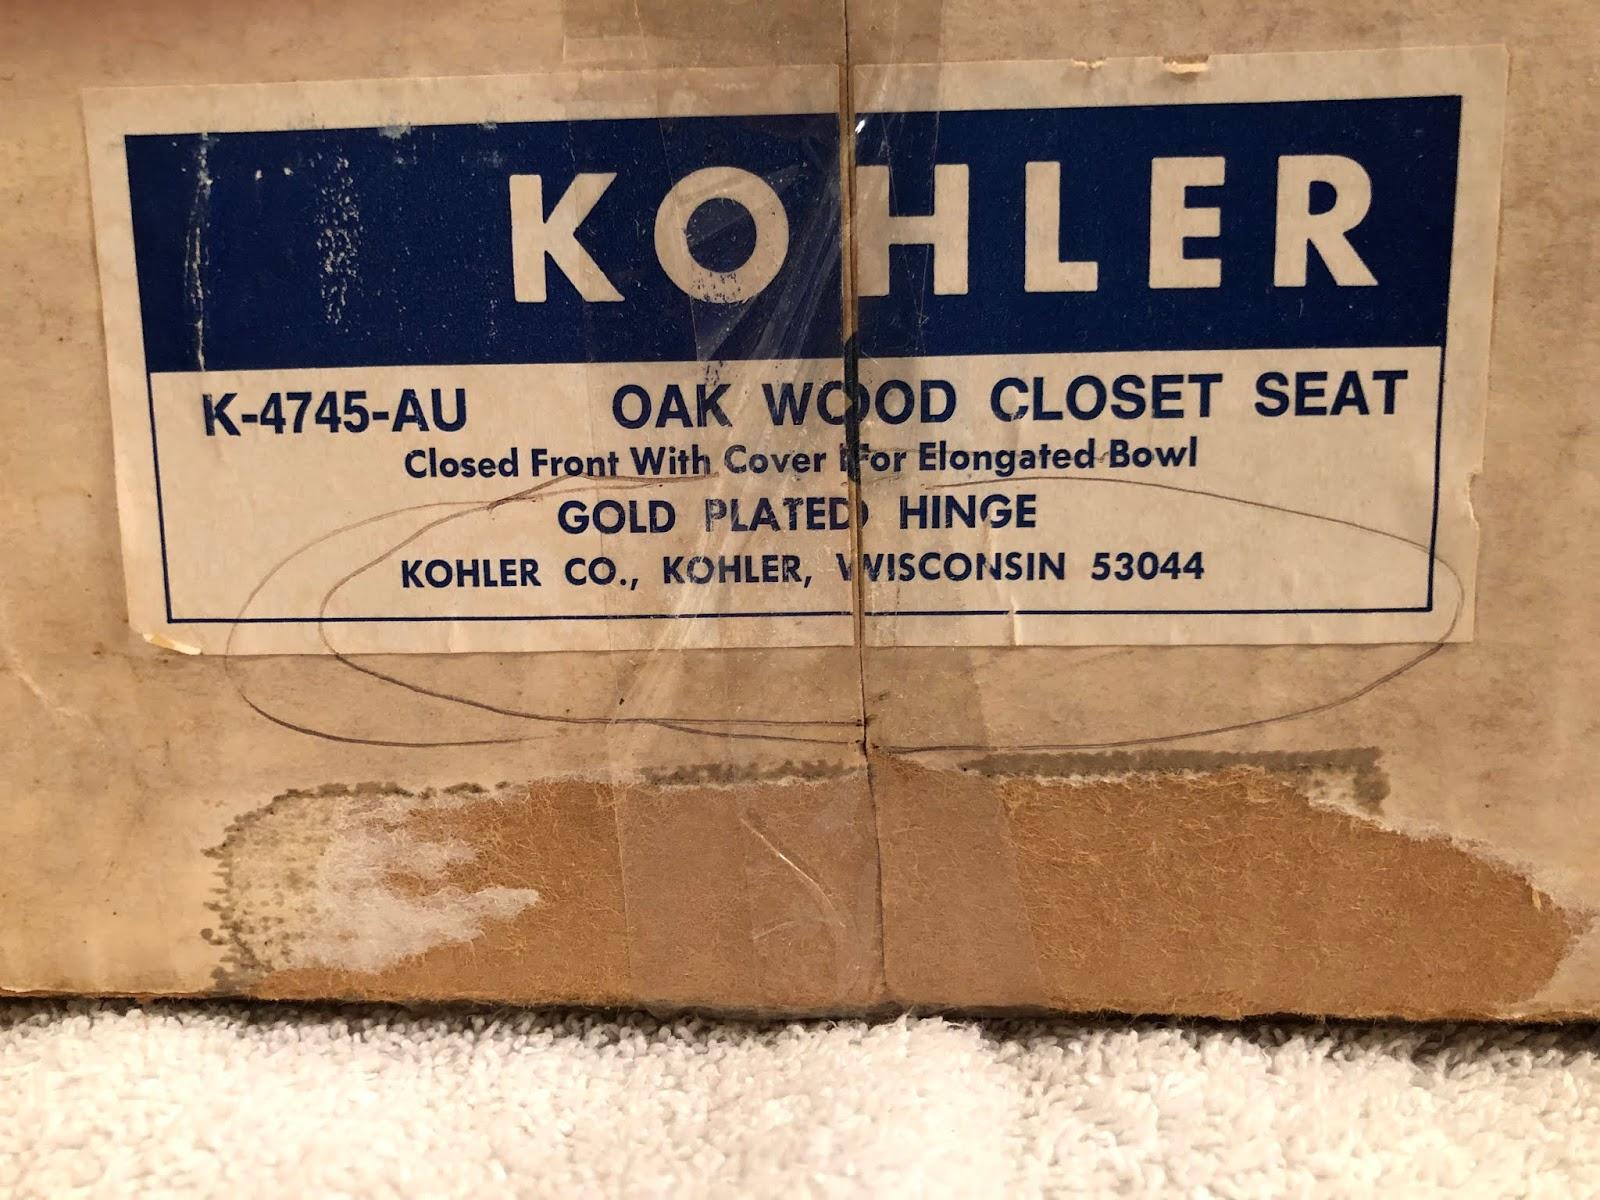 Admirable Find Discontinued Plumbing Fixtures Kohler K 4745 Au Beatyapartments Chair Design Images Beatyapartmentscom